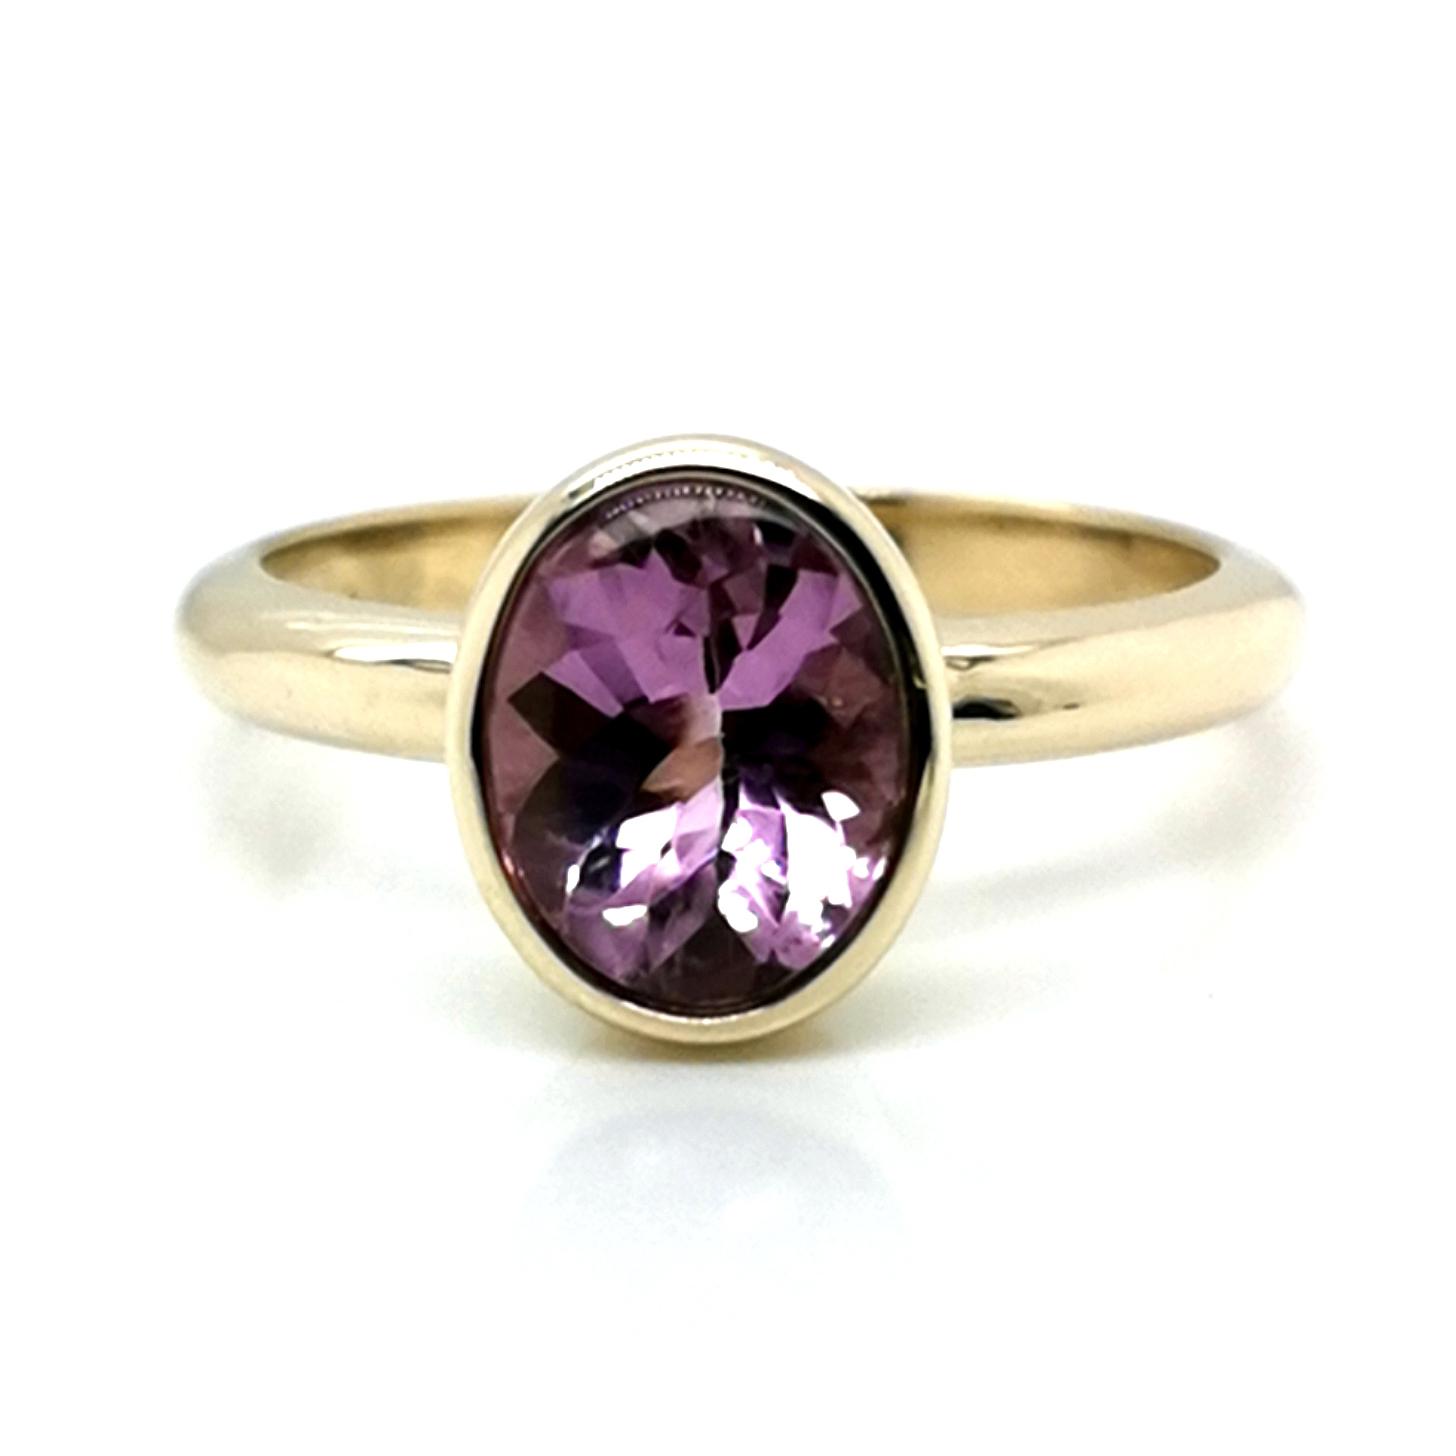 Ring mit Pink Turmalin, Bufftop, ca. 2 ct Edelstein, aus 375 Gelbgold, Sogni d´oro